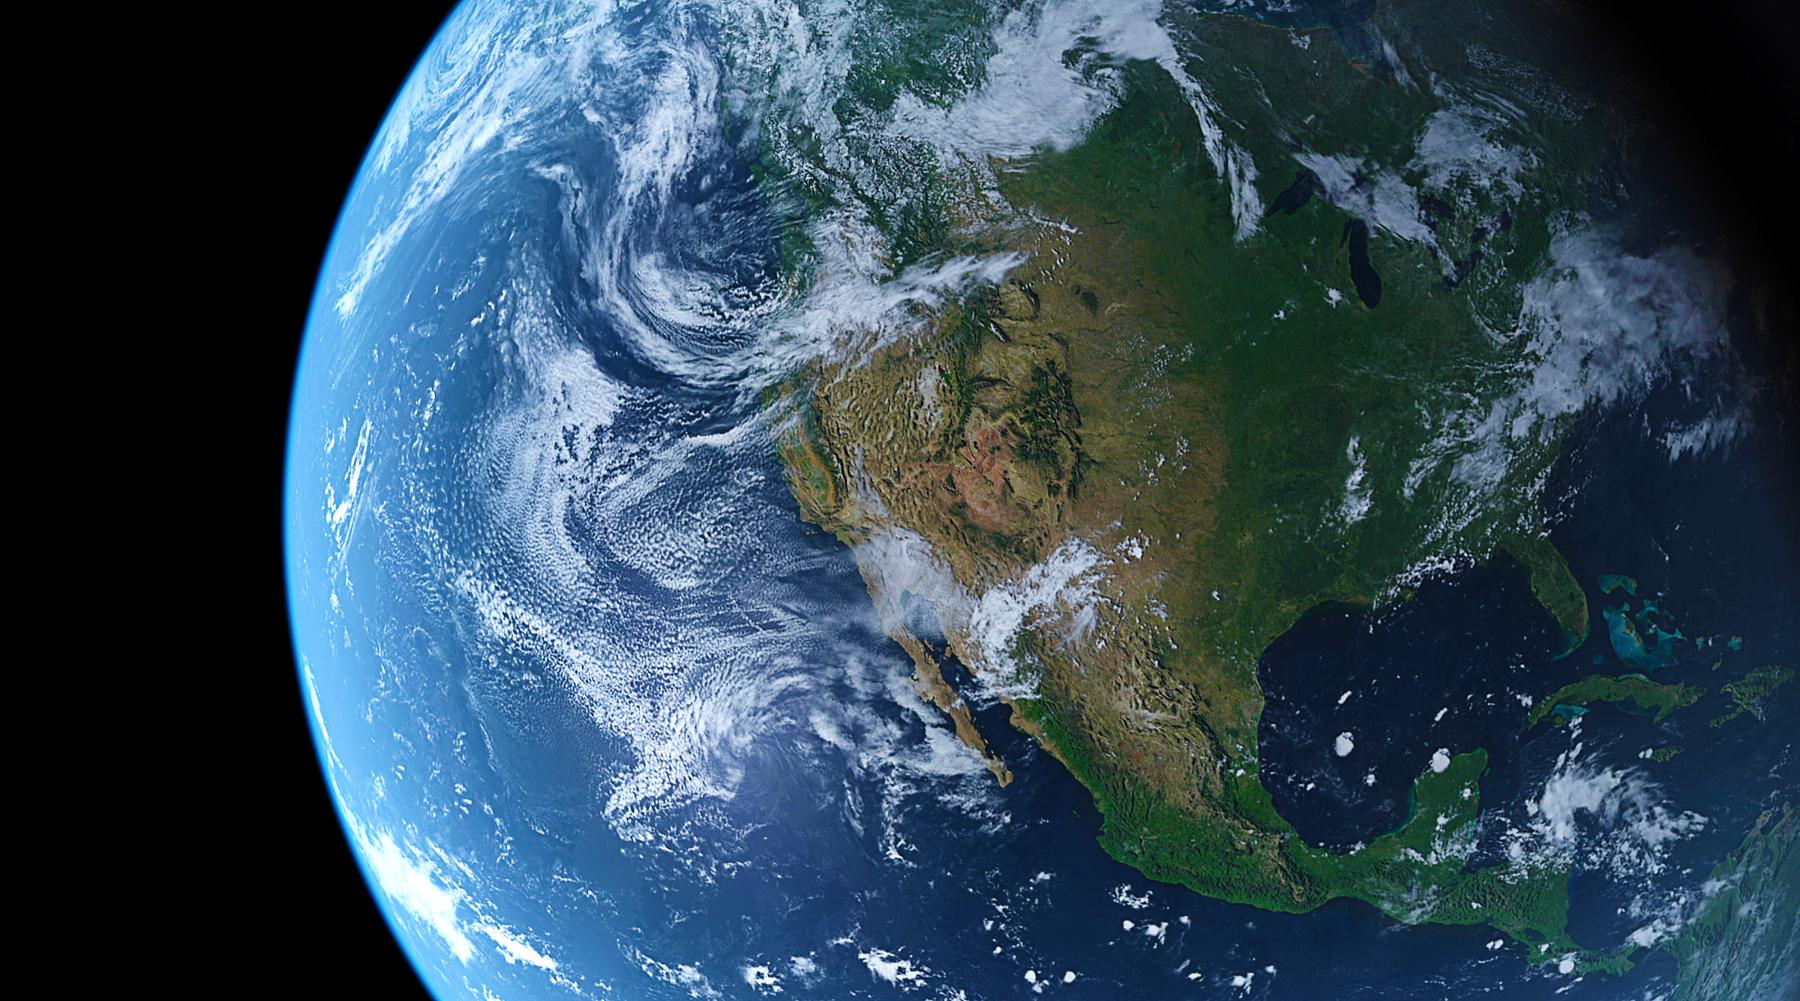 stock-photo-4k-planet-earth-72196451